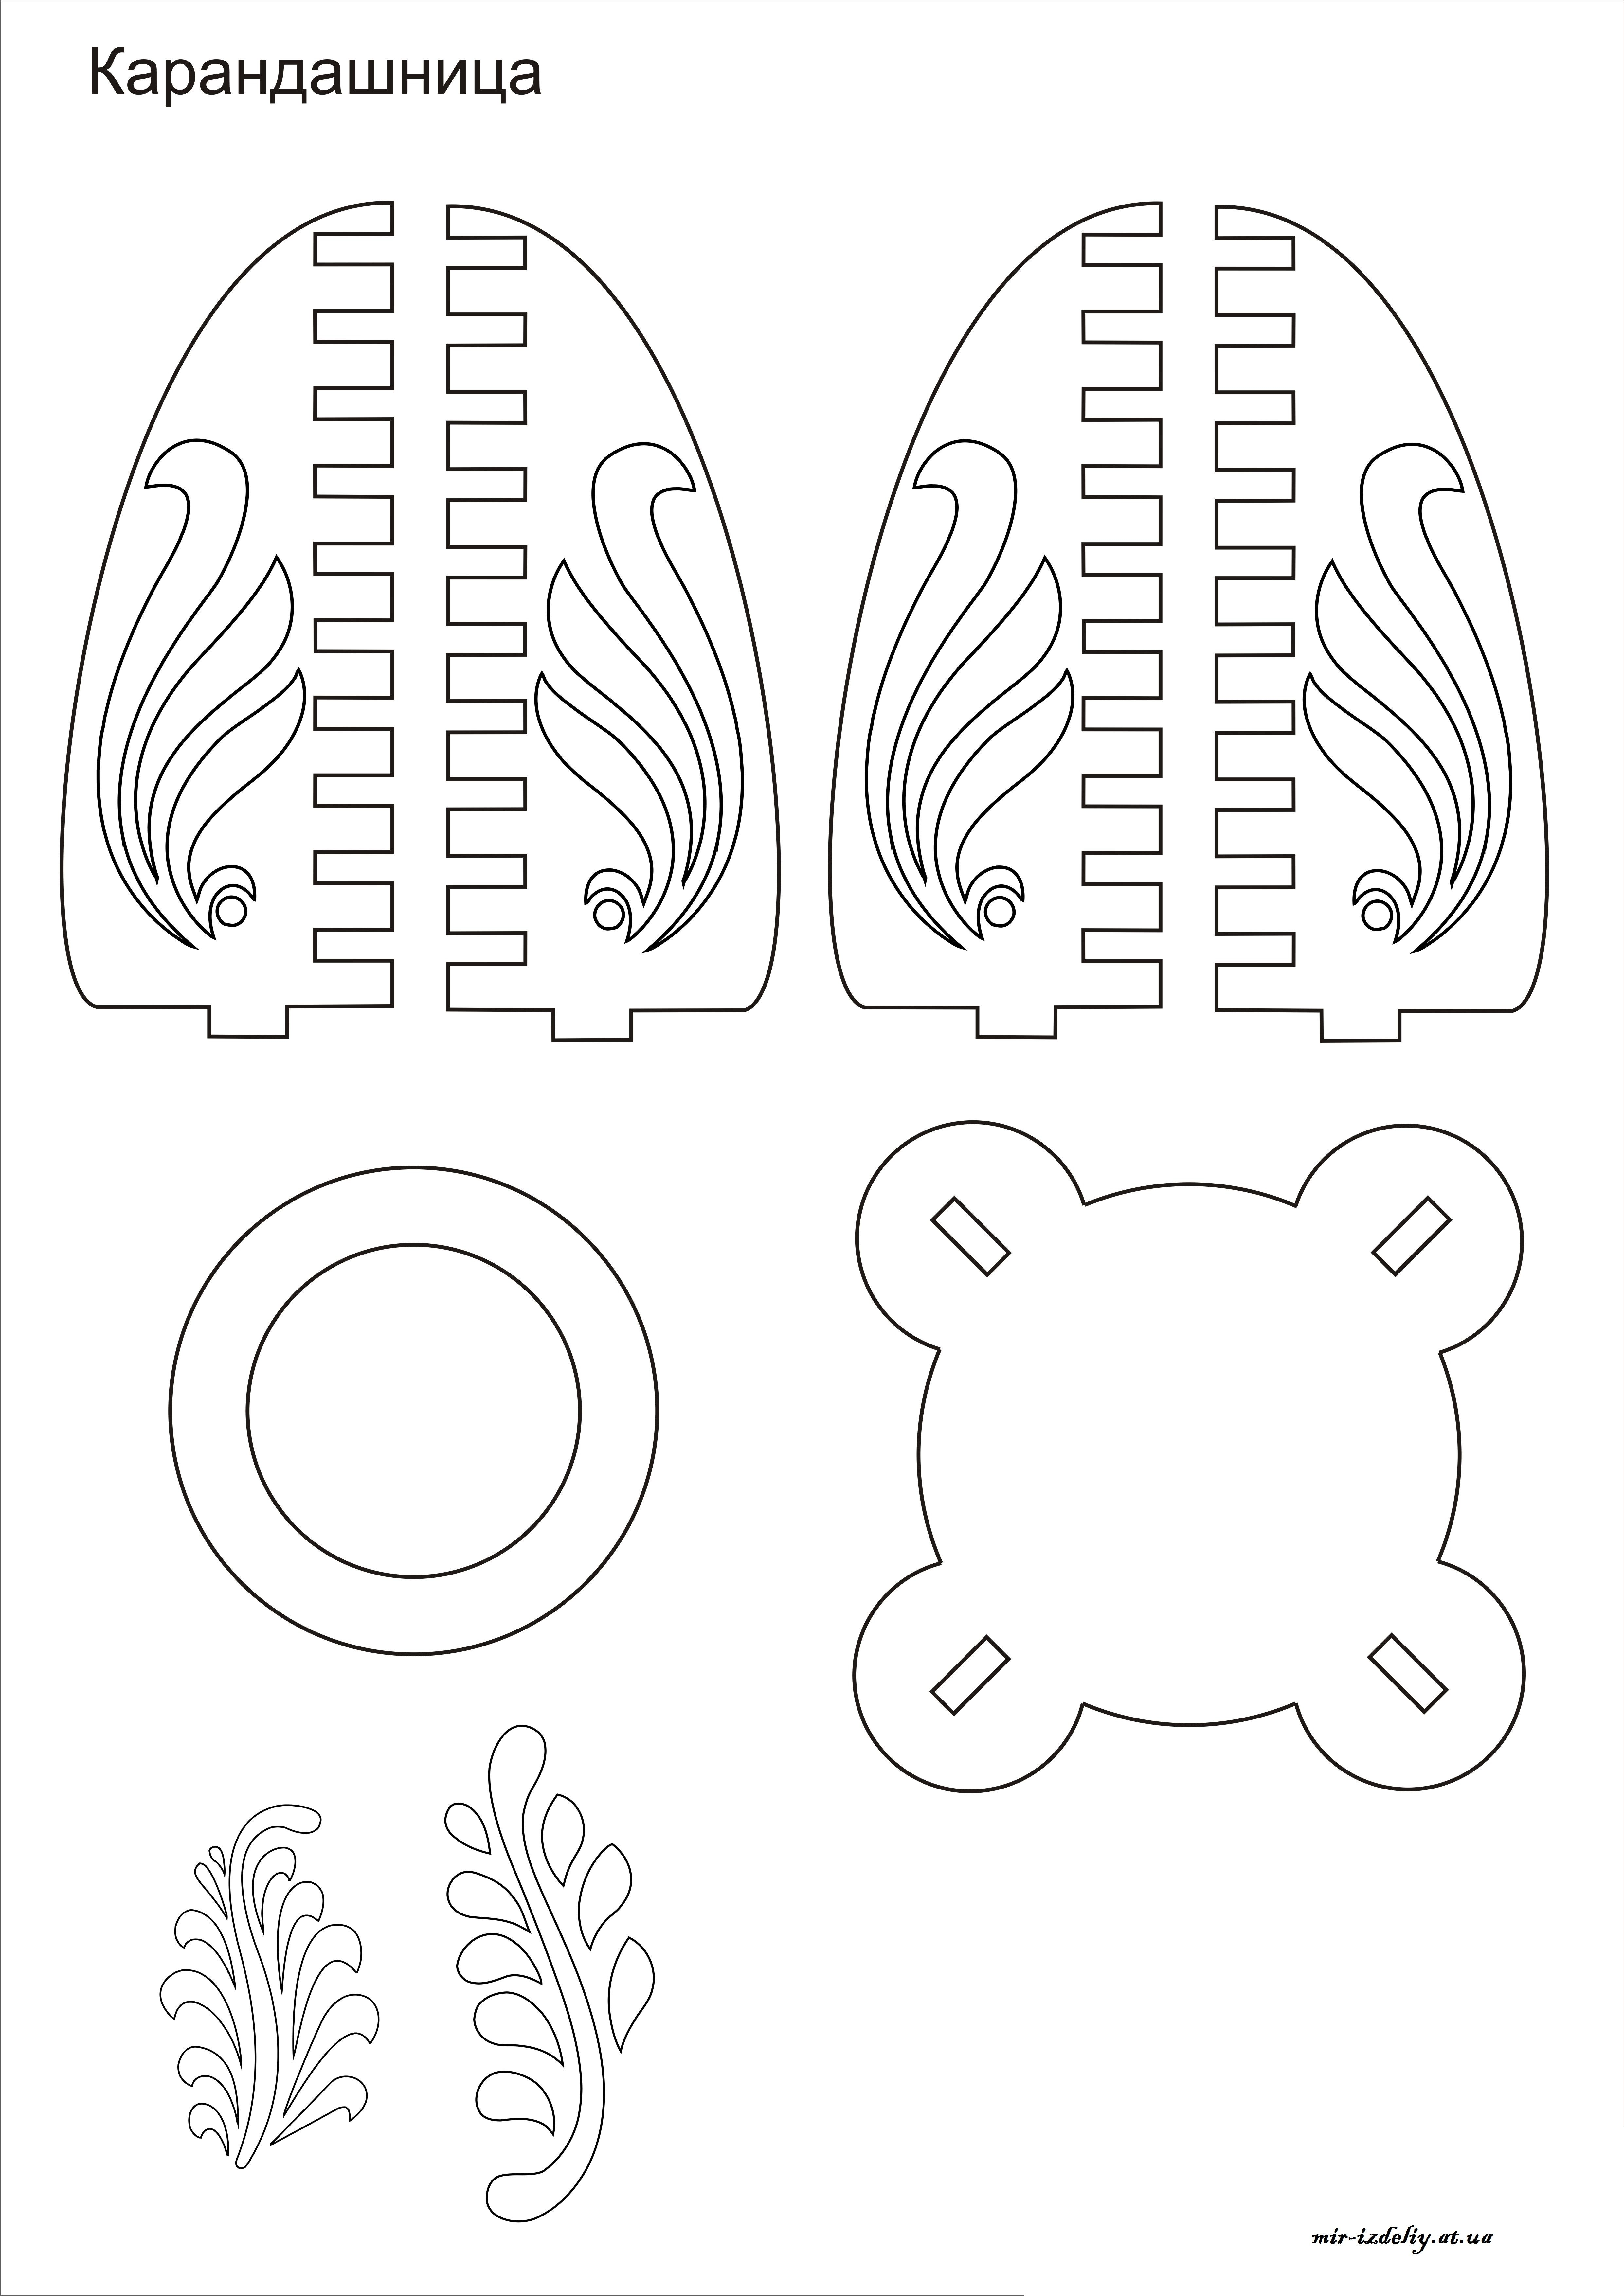 Pin de Олег Дрыга en канцелярия | Pinterest | Trabajos en madera ...